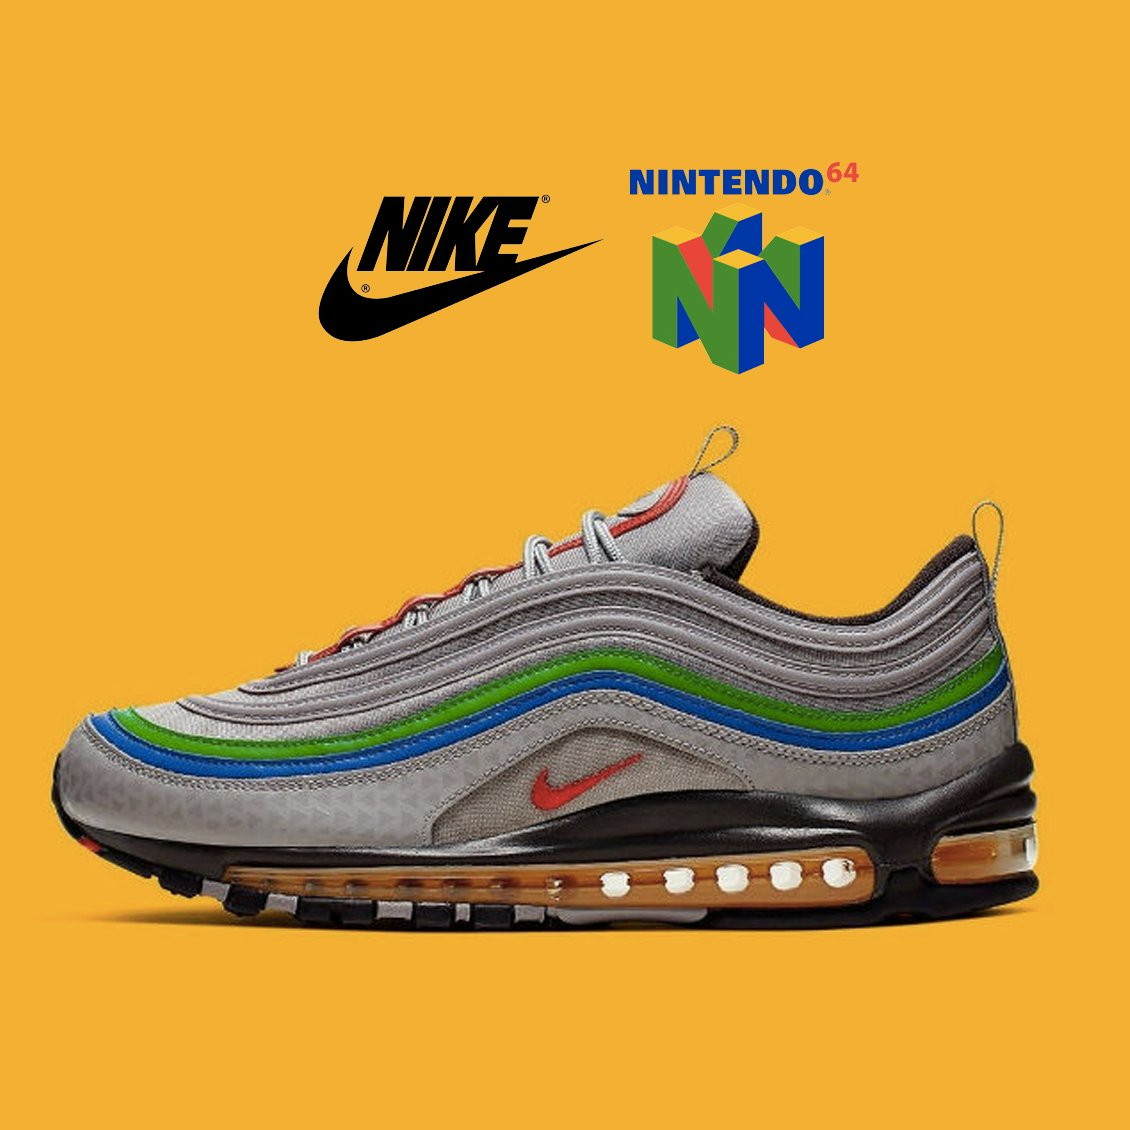 Nike : des Air Max 97 en hommage à la Nintendo 64 !